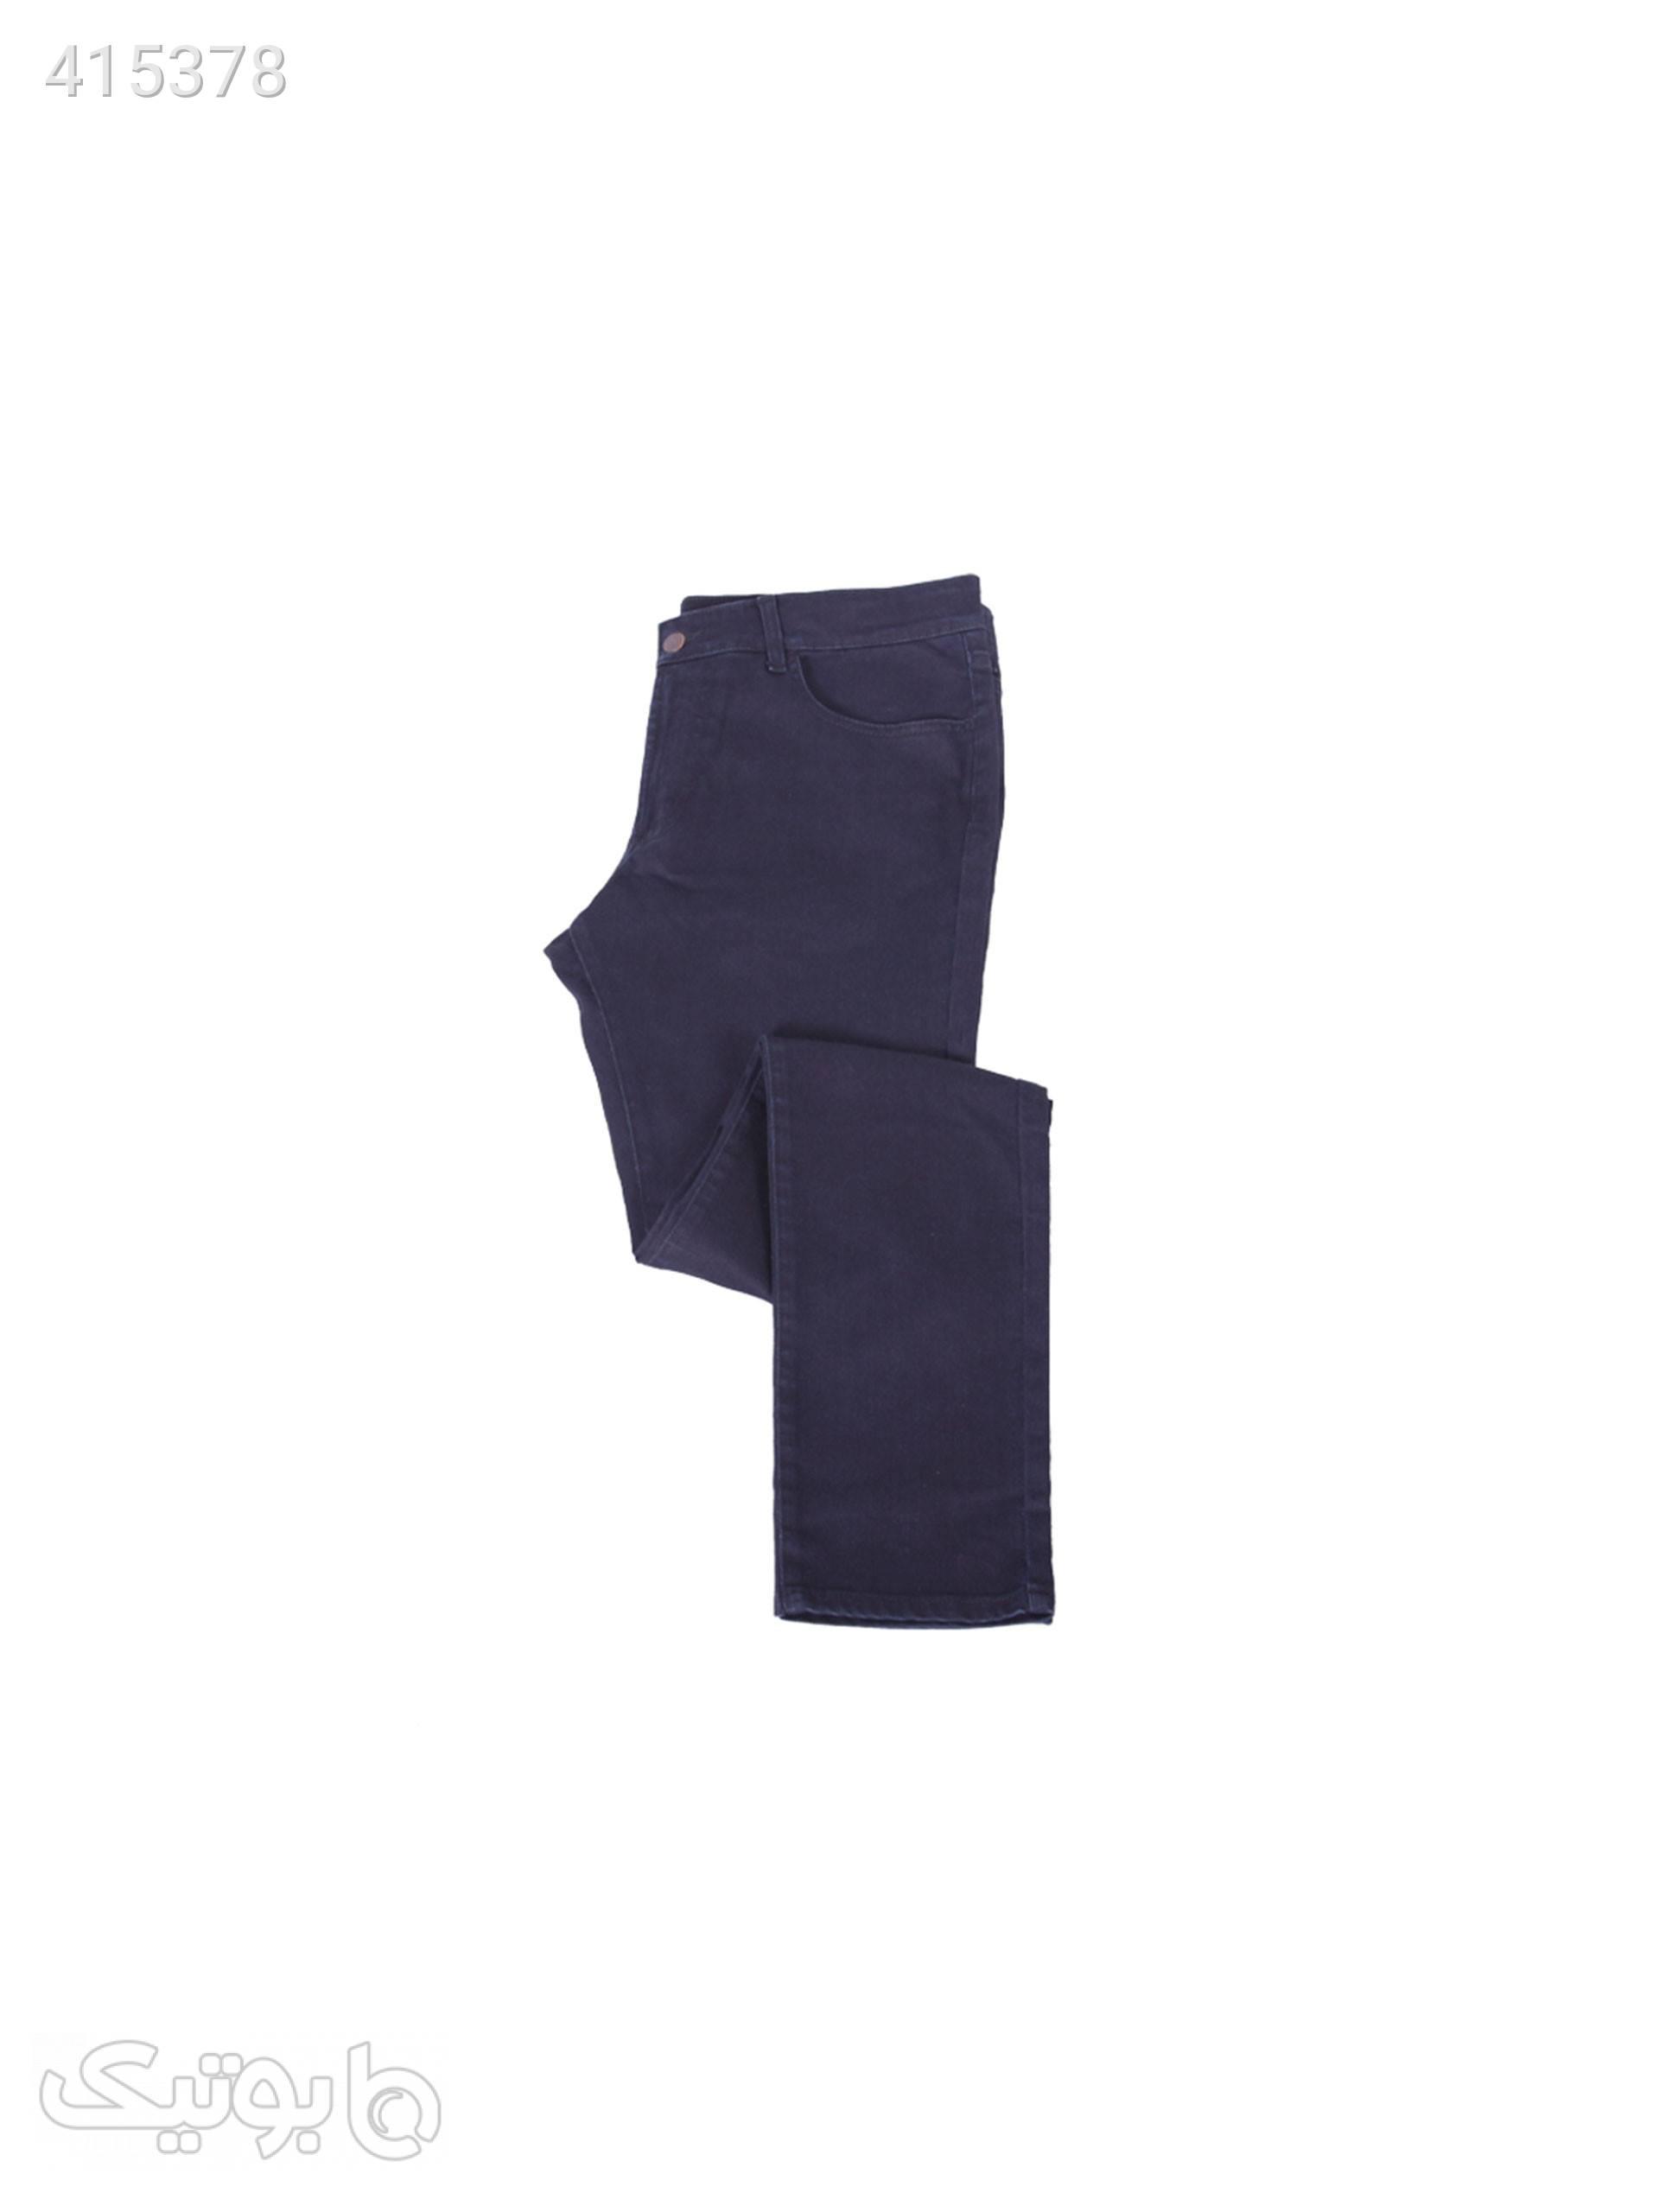 شلوار جین مردانه کد EL-72 سورمه ای شلوار مردانه